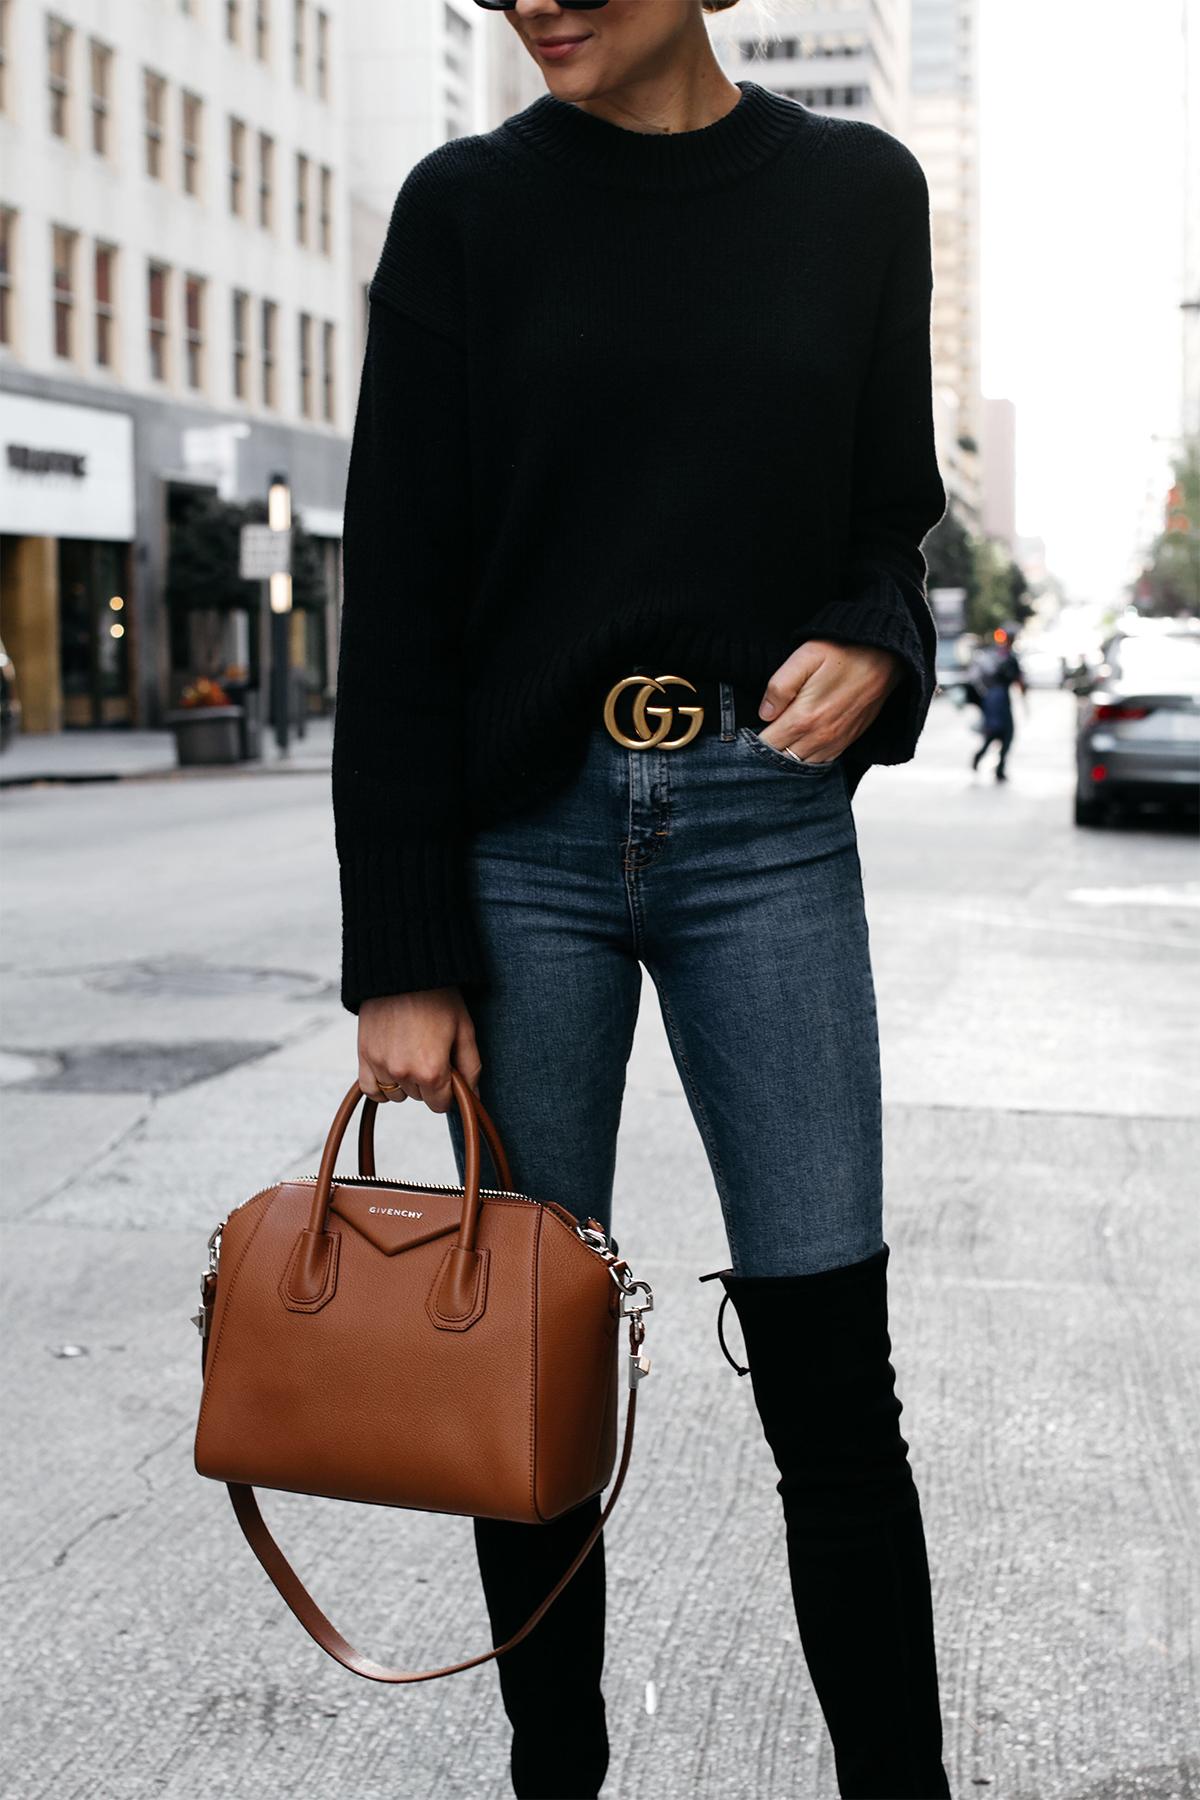 Everlane Black Oversized Sweater Denim Skinny Jeans Gucci Marmont Belt Stuart Weitzman Black Over the Knee Boots Givenchy Antigona Cognac Satchel Fashion Jackson Dallas Blogger Fashion Blogger Street Style